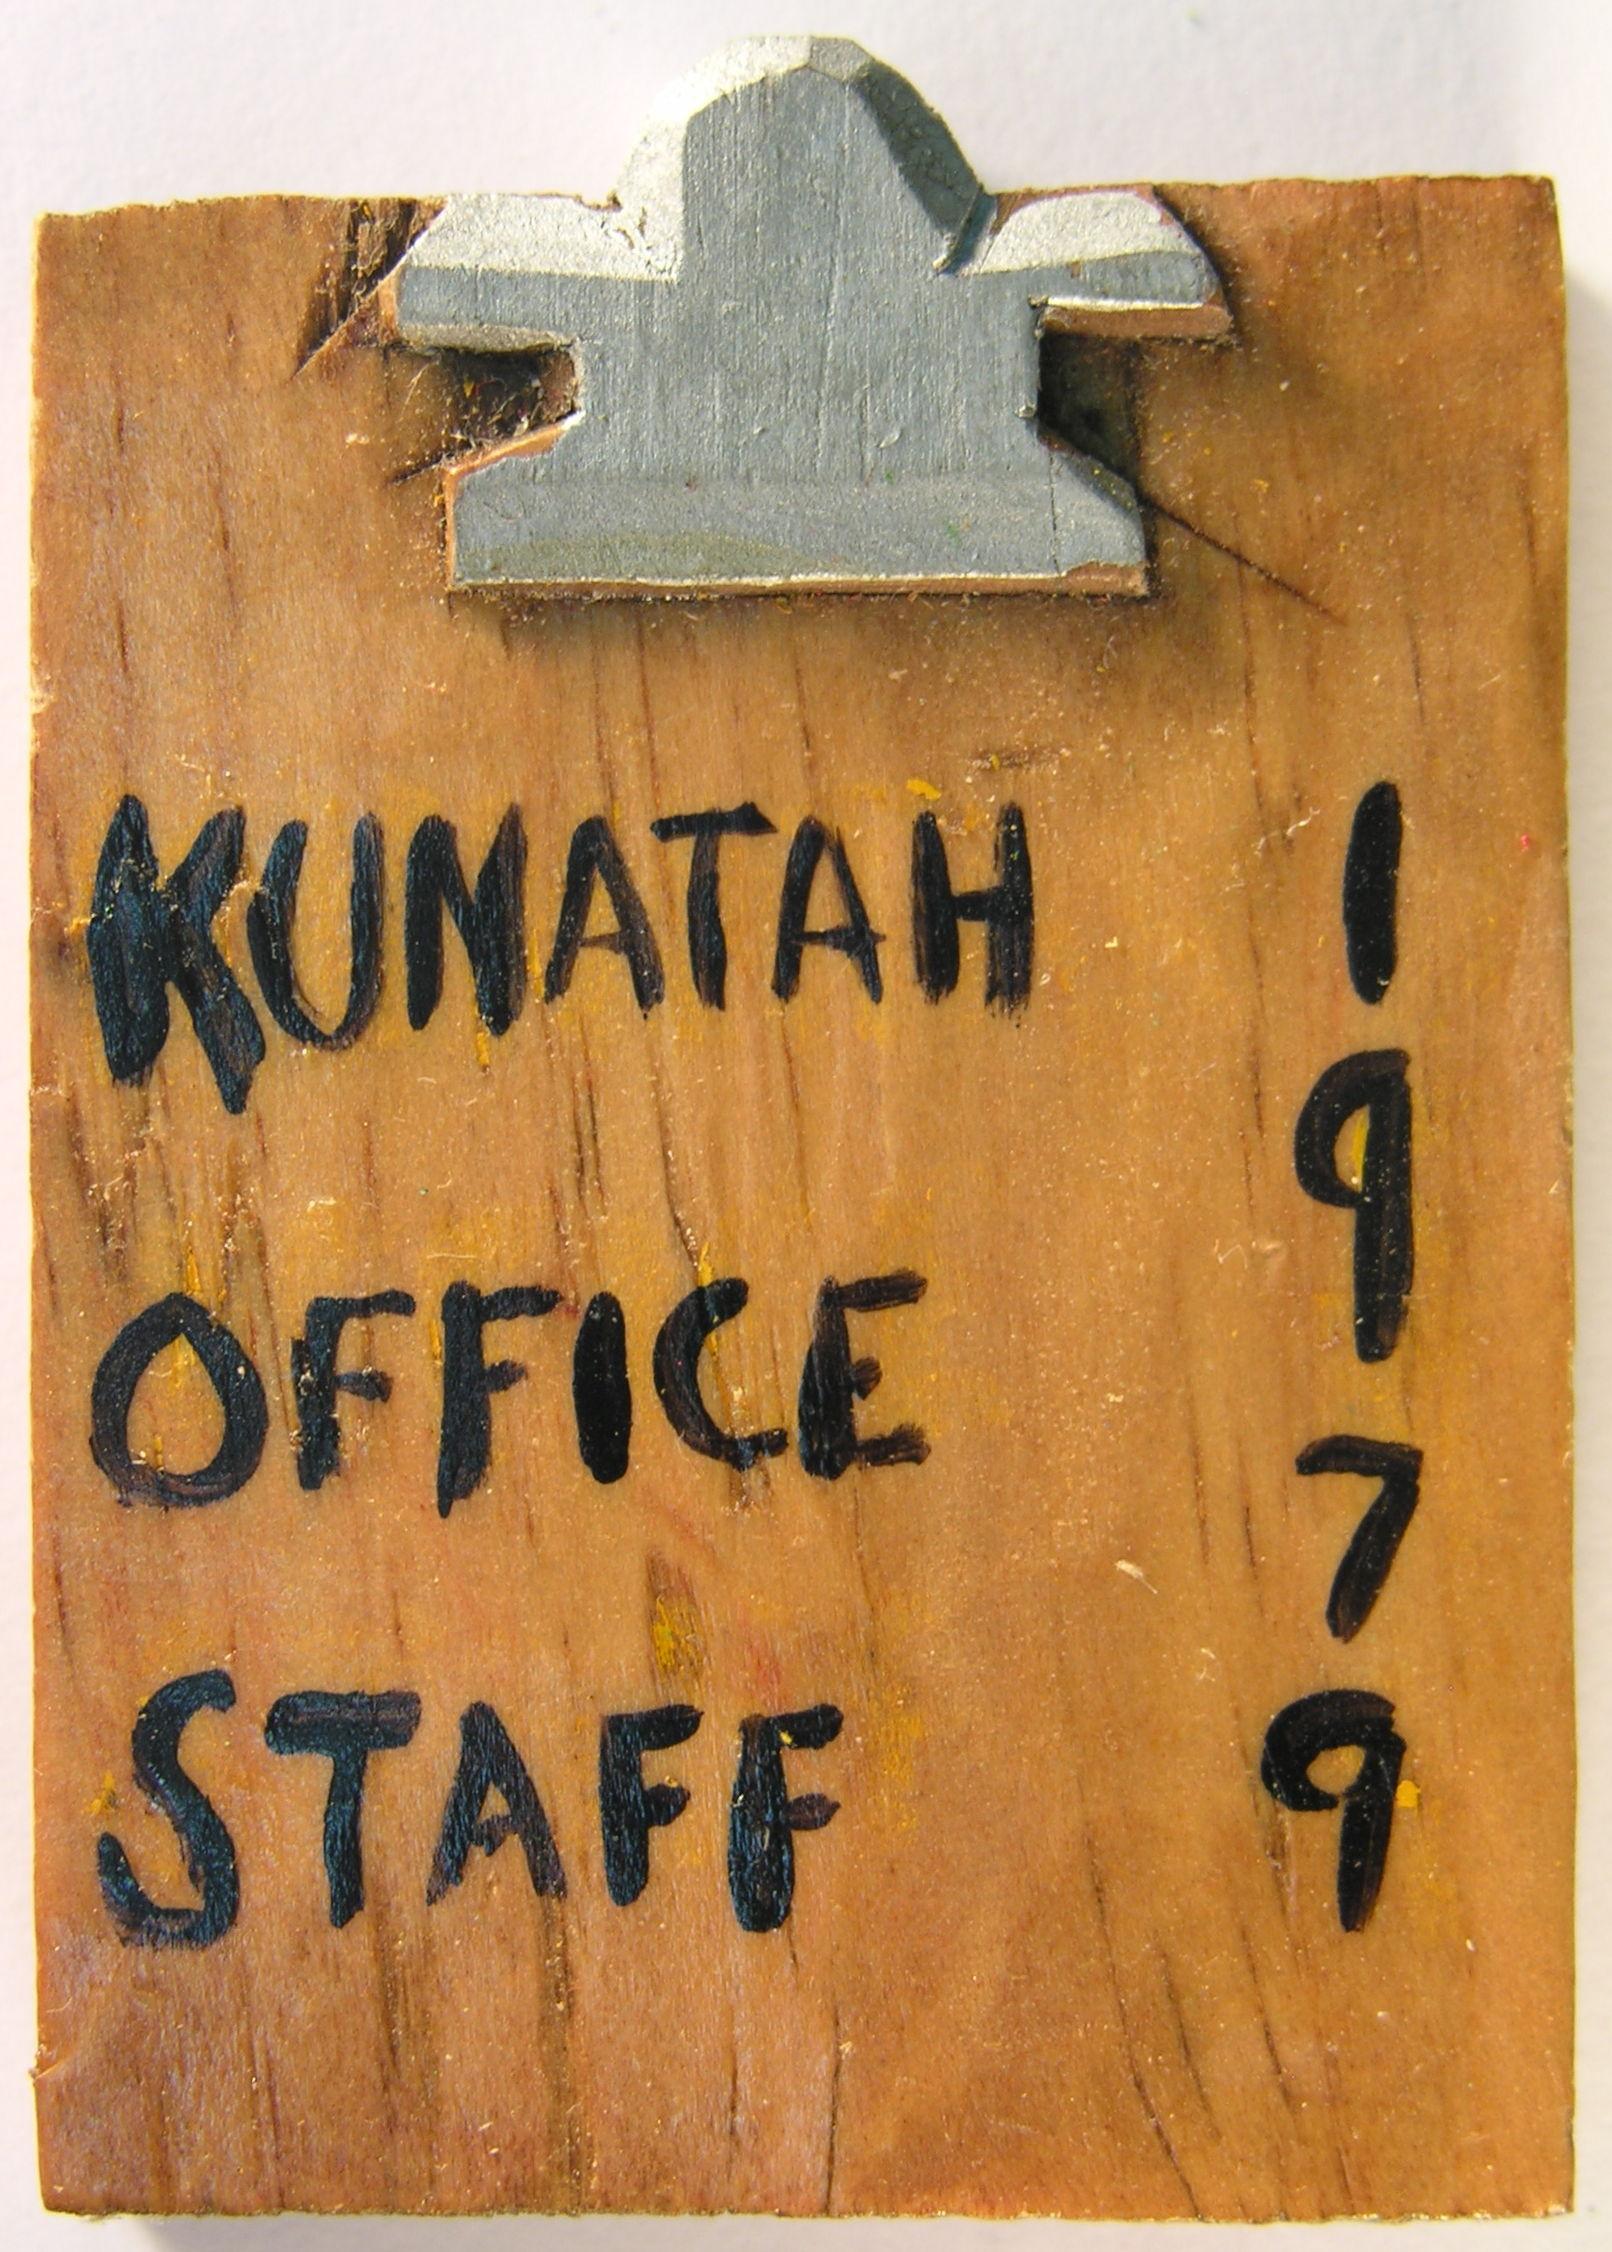 Camp Kunatah-21